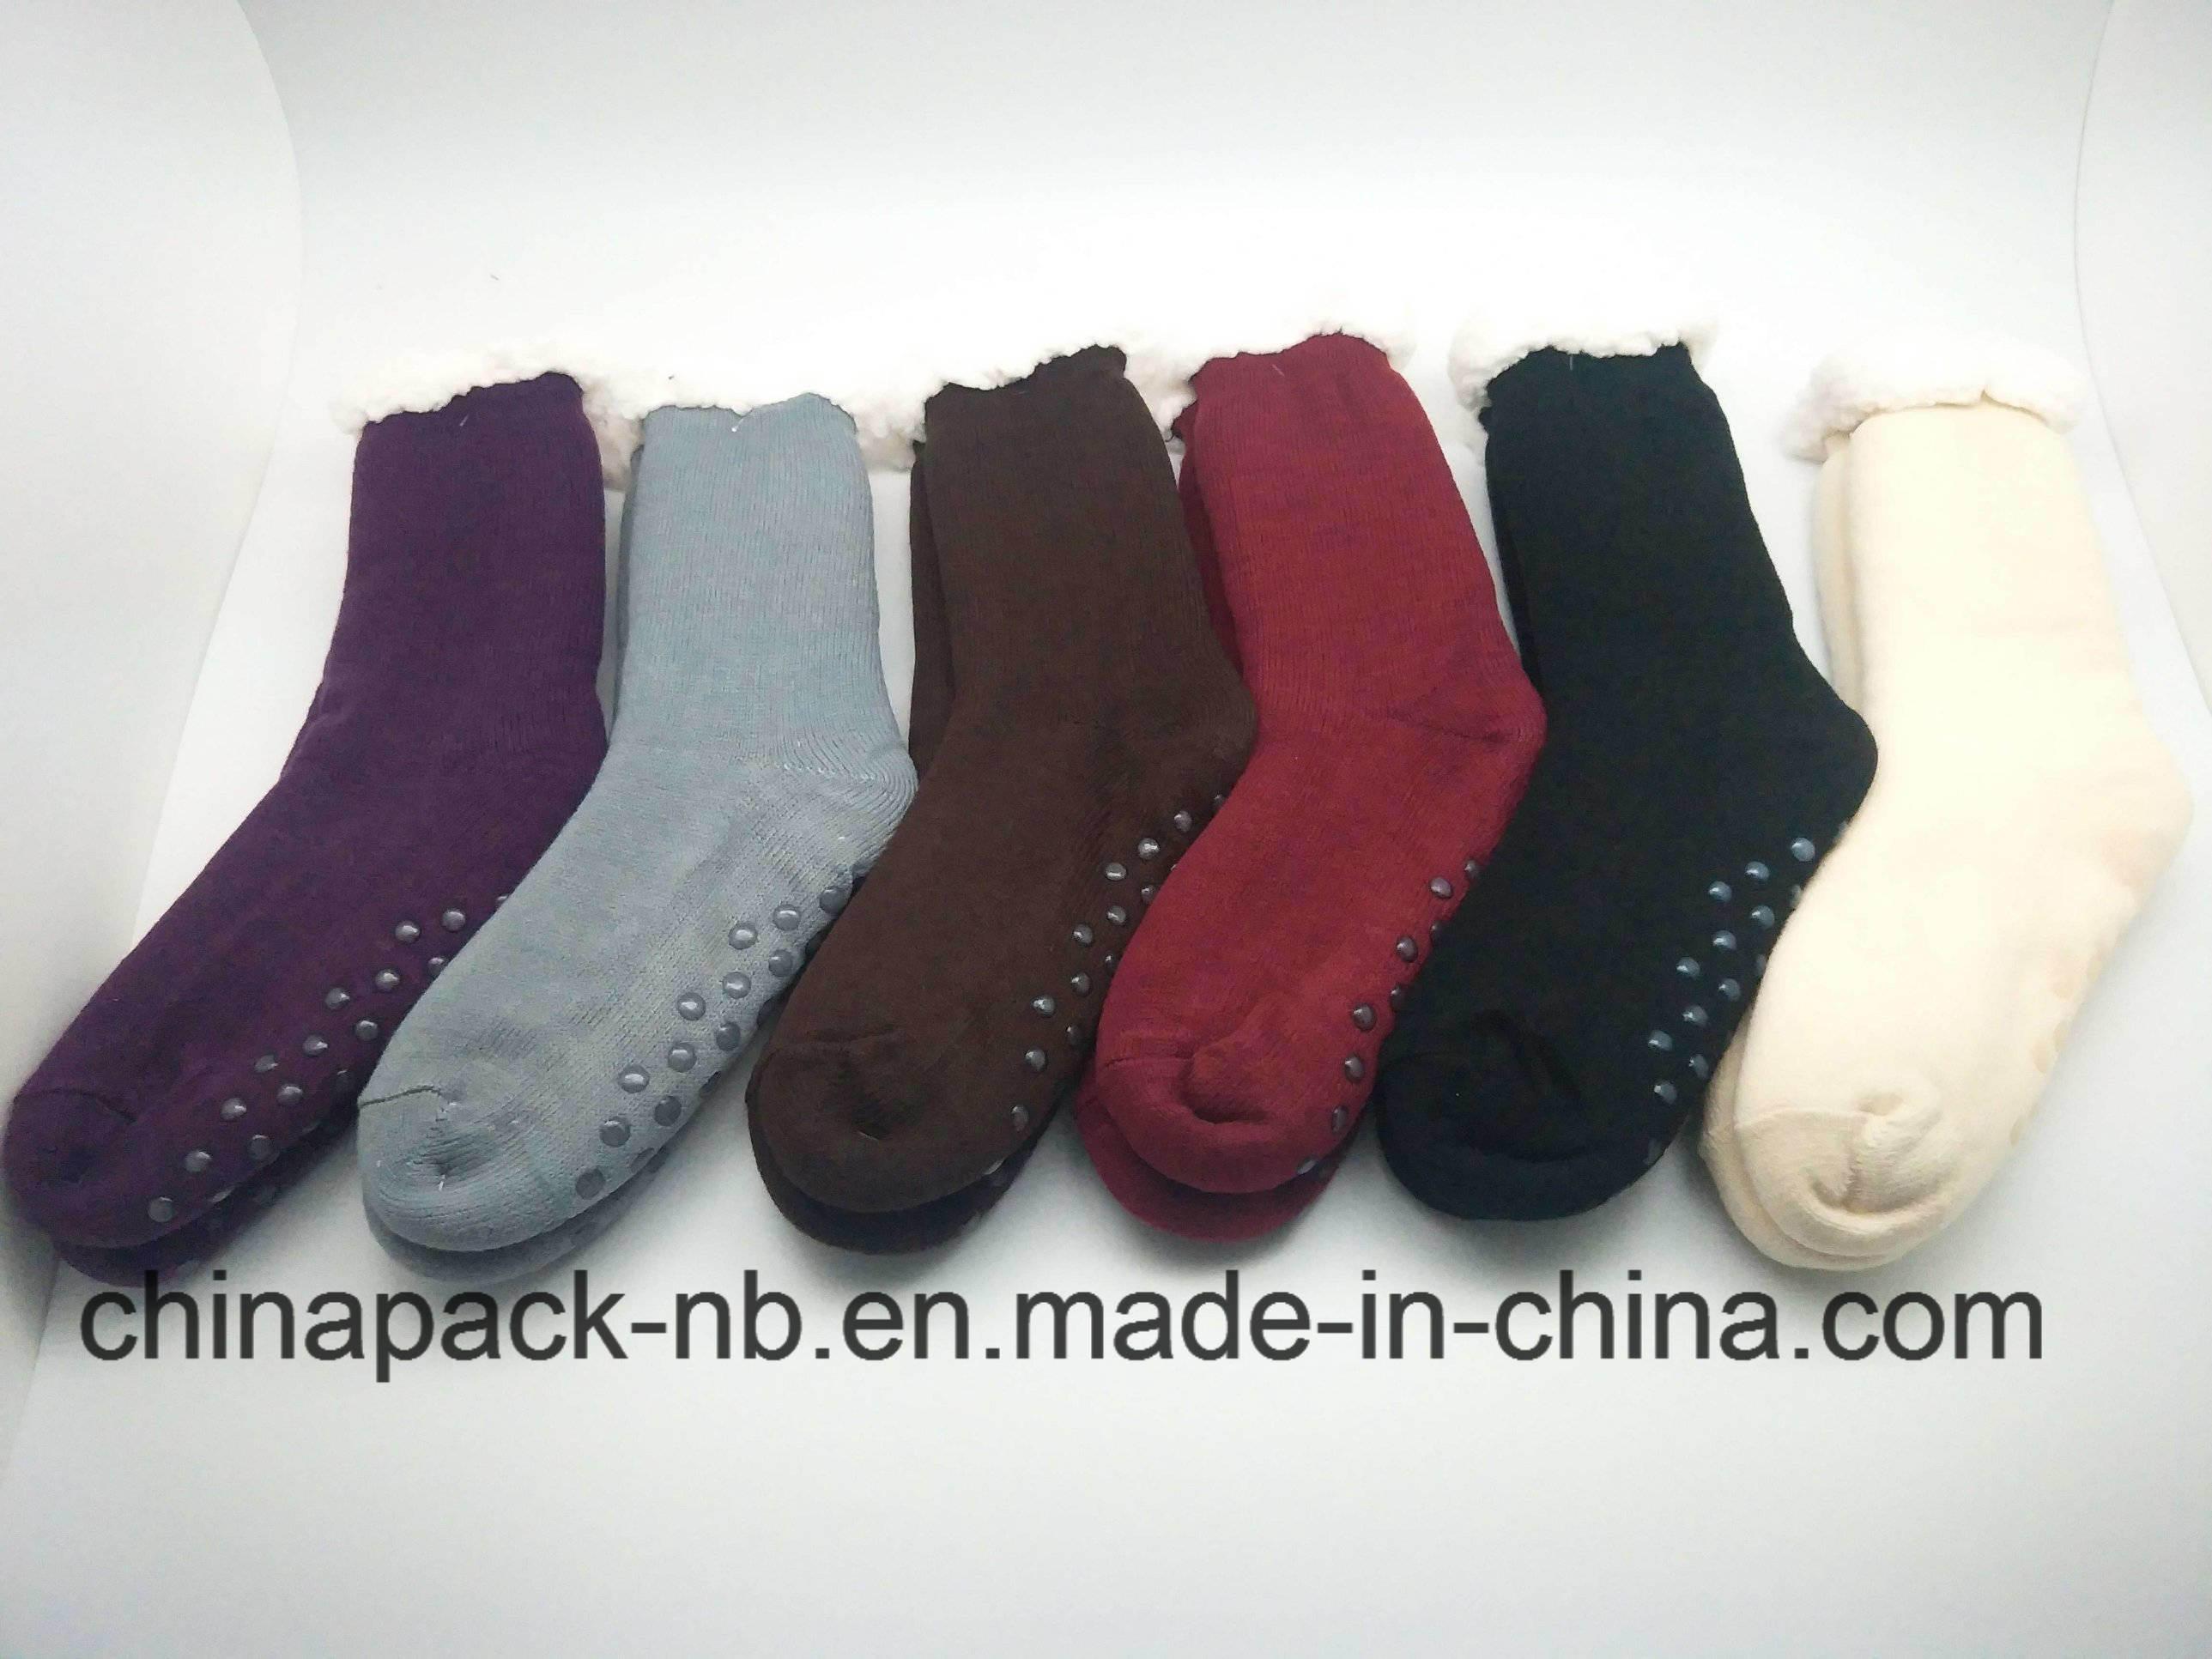 Homesocks Cotton Socks Solid Color, Single Color, Legging Sock